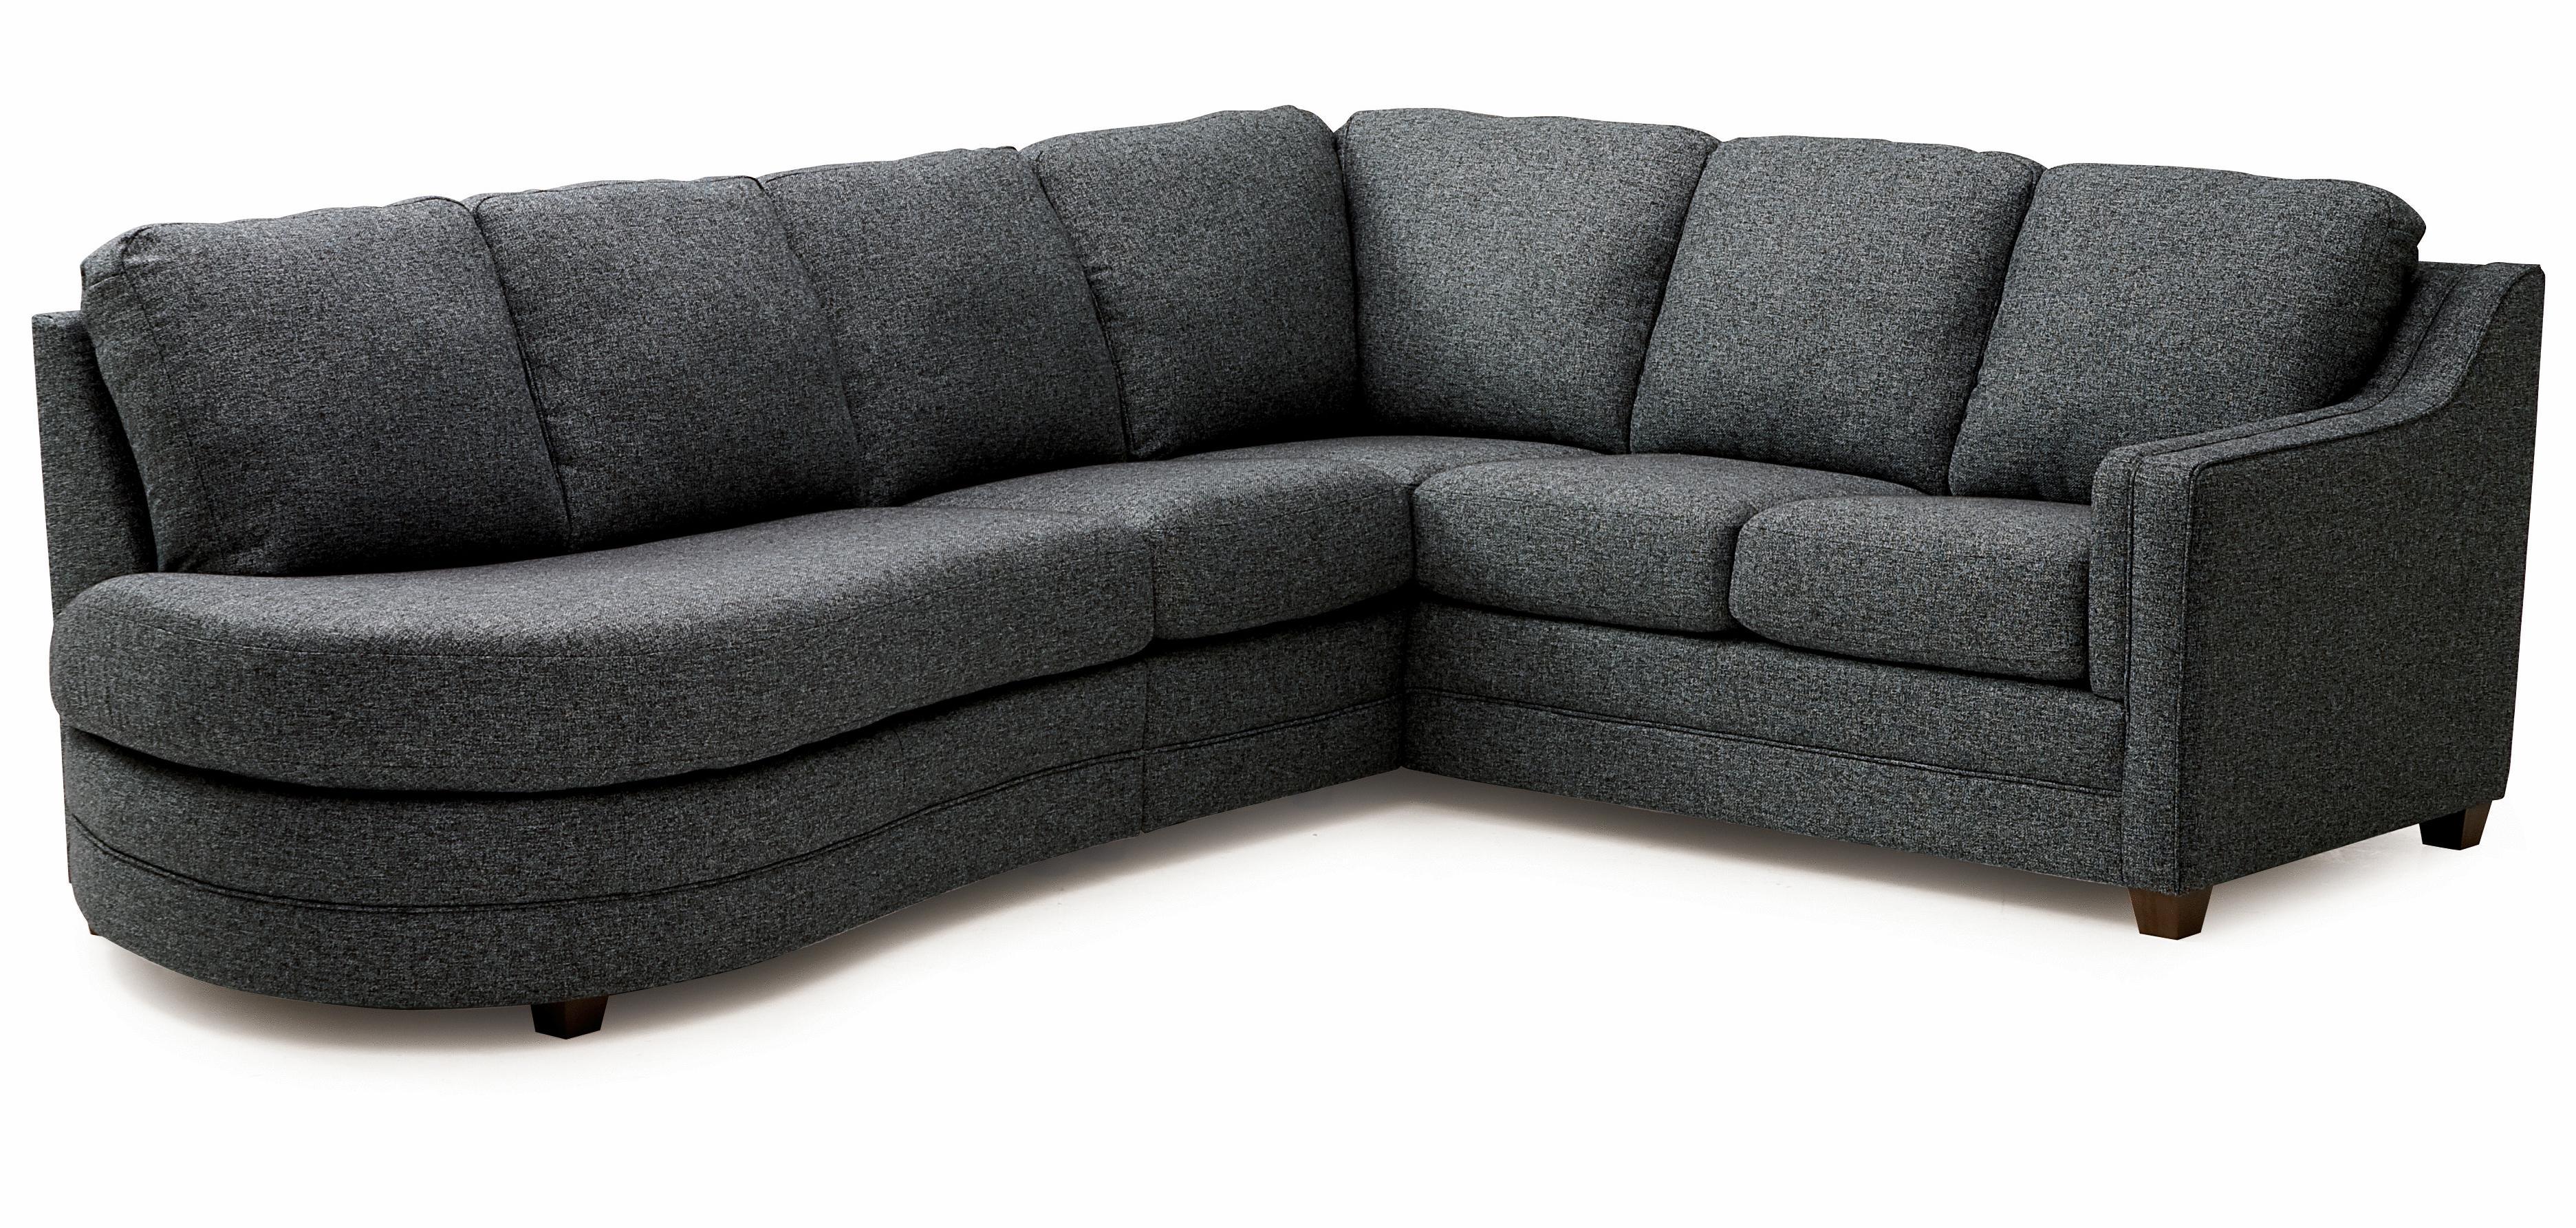 Palliser Corissa Sectional Sofa - Item Number: 70500-20+10+11+08